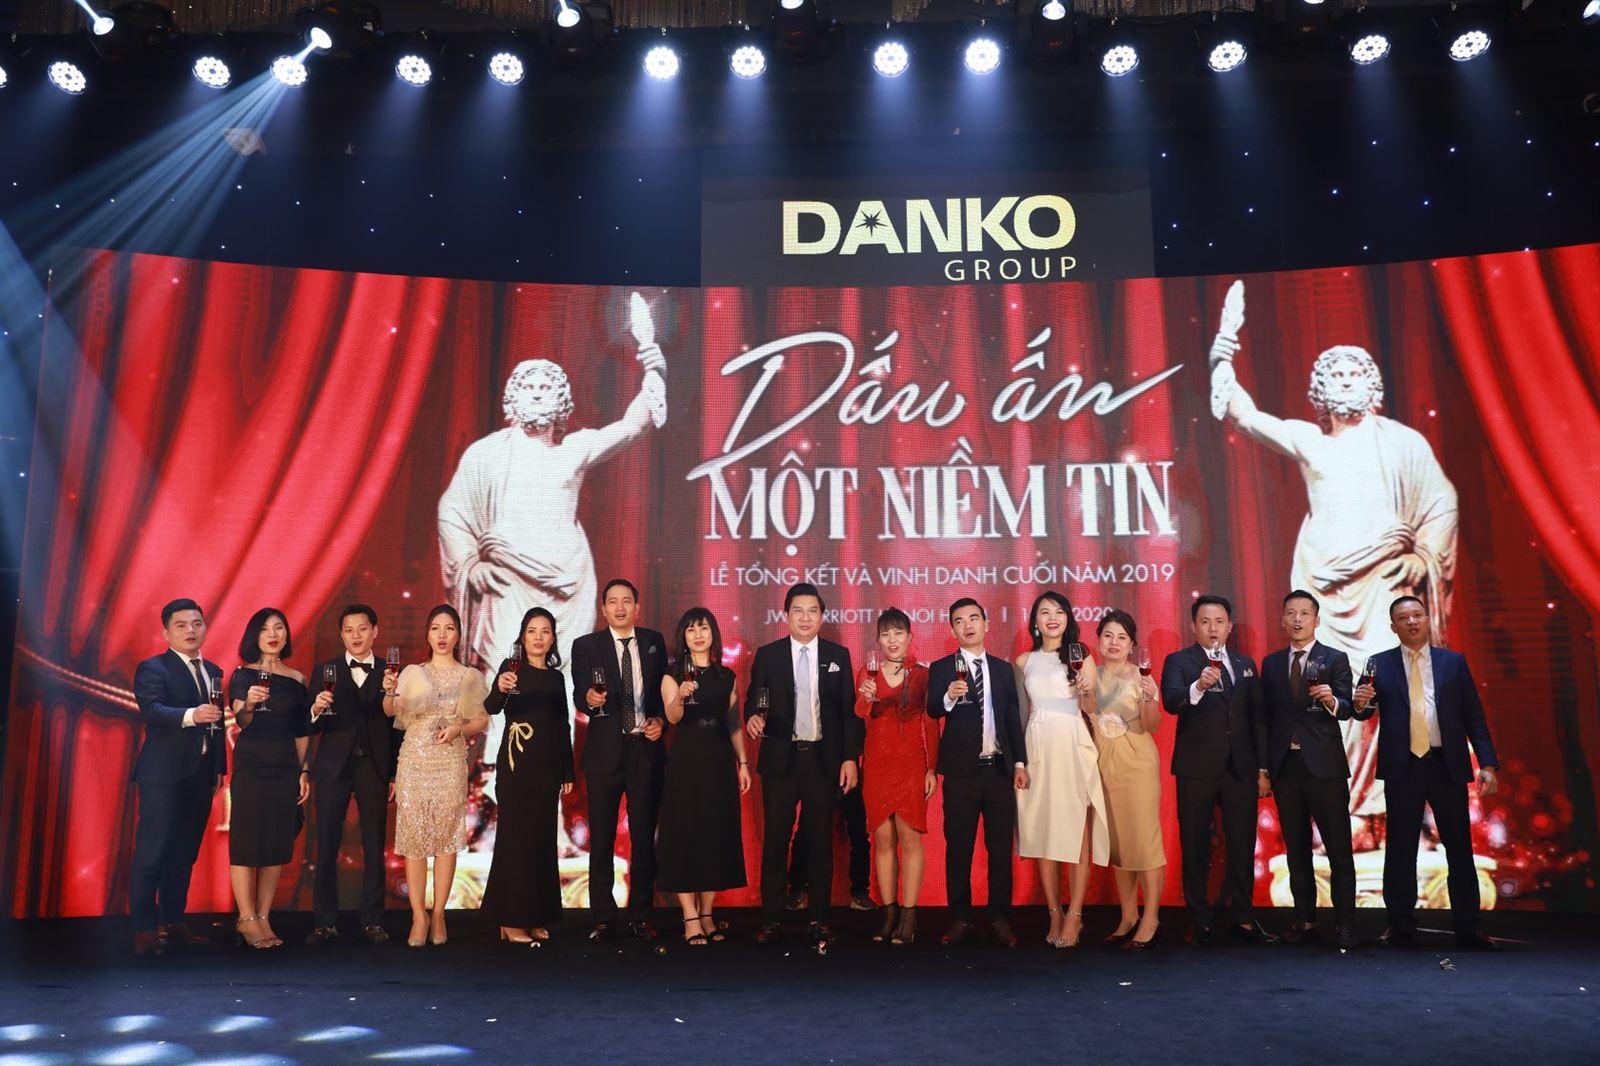 DẤU ẤN MỘT NIỀM TIN - GALA DANKO YEAR-END PARTY 2019